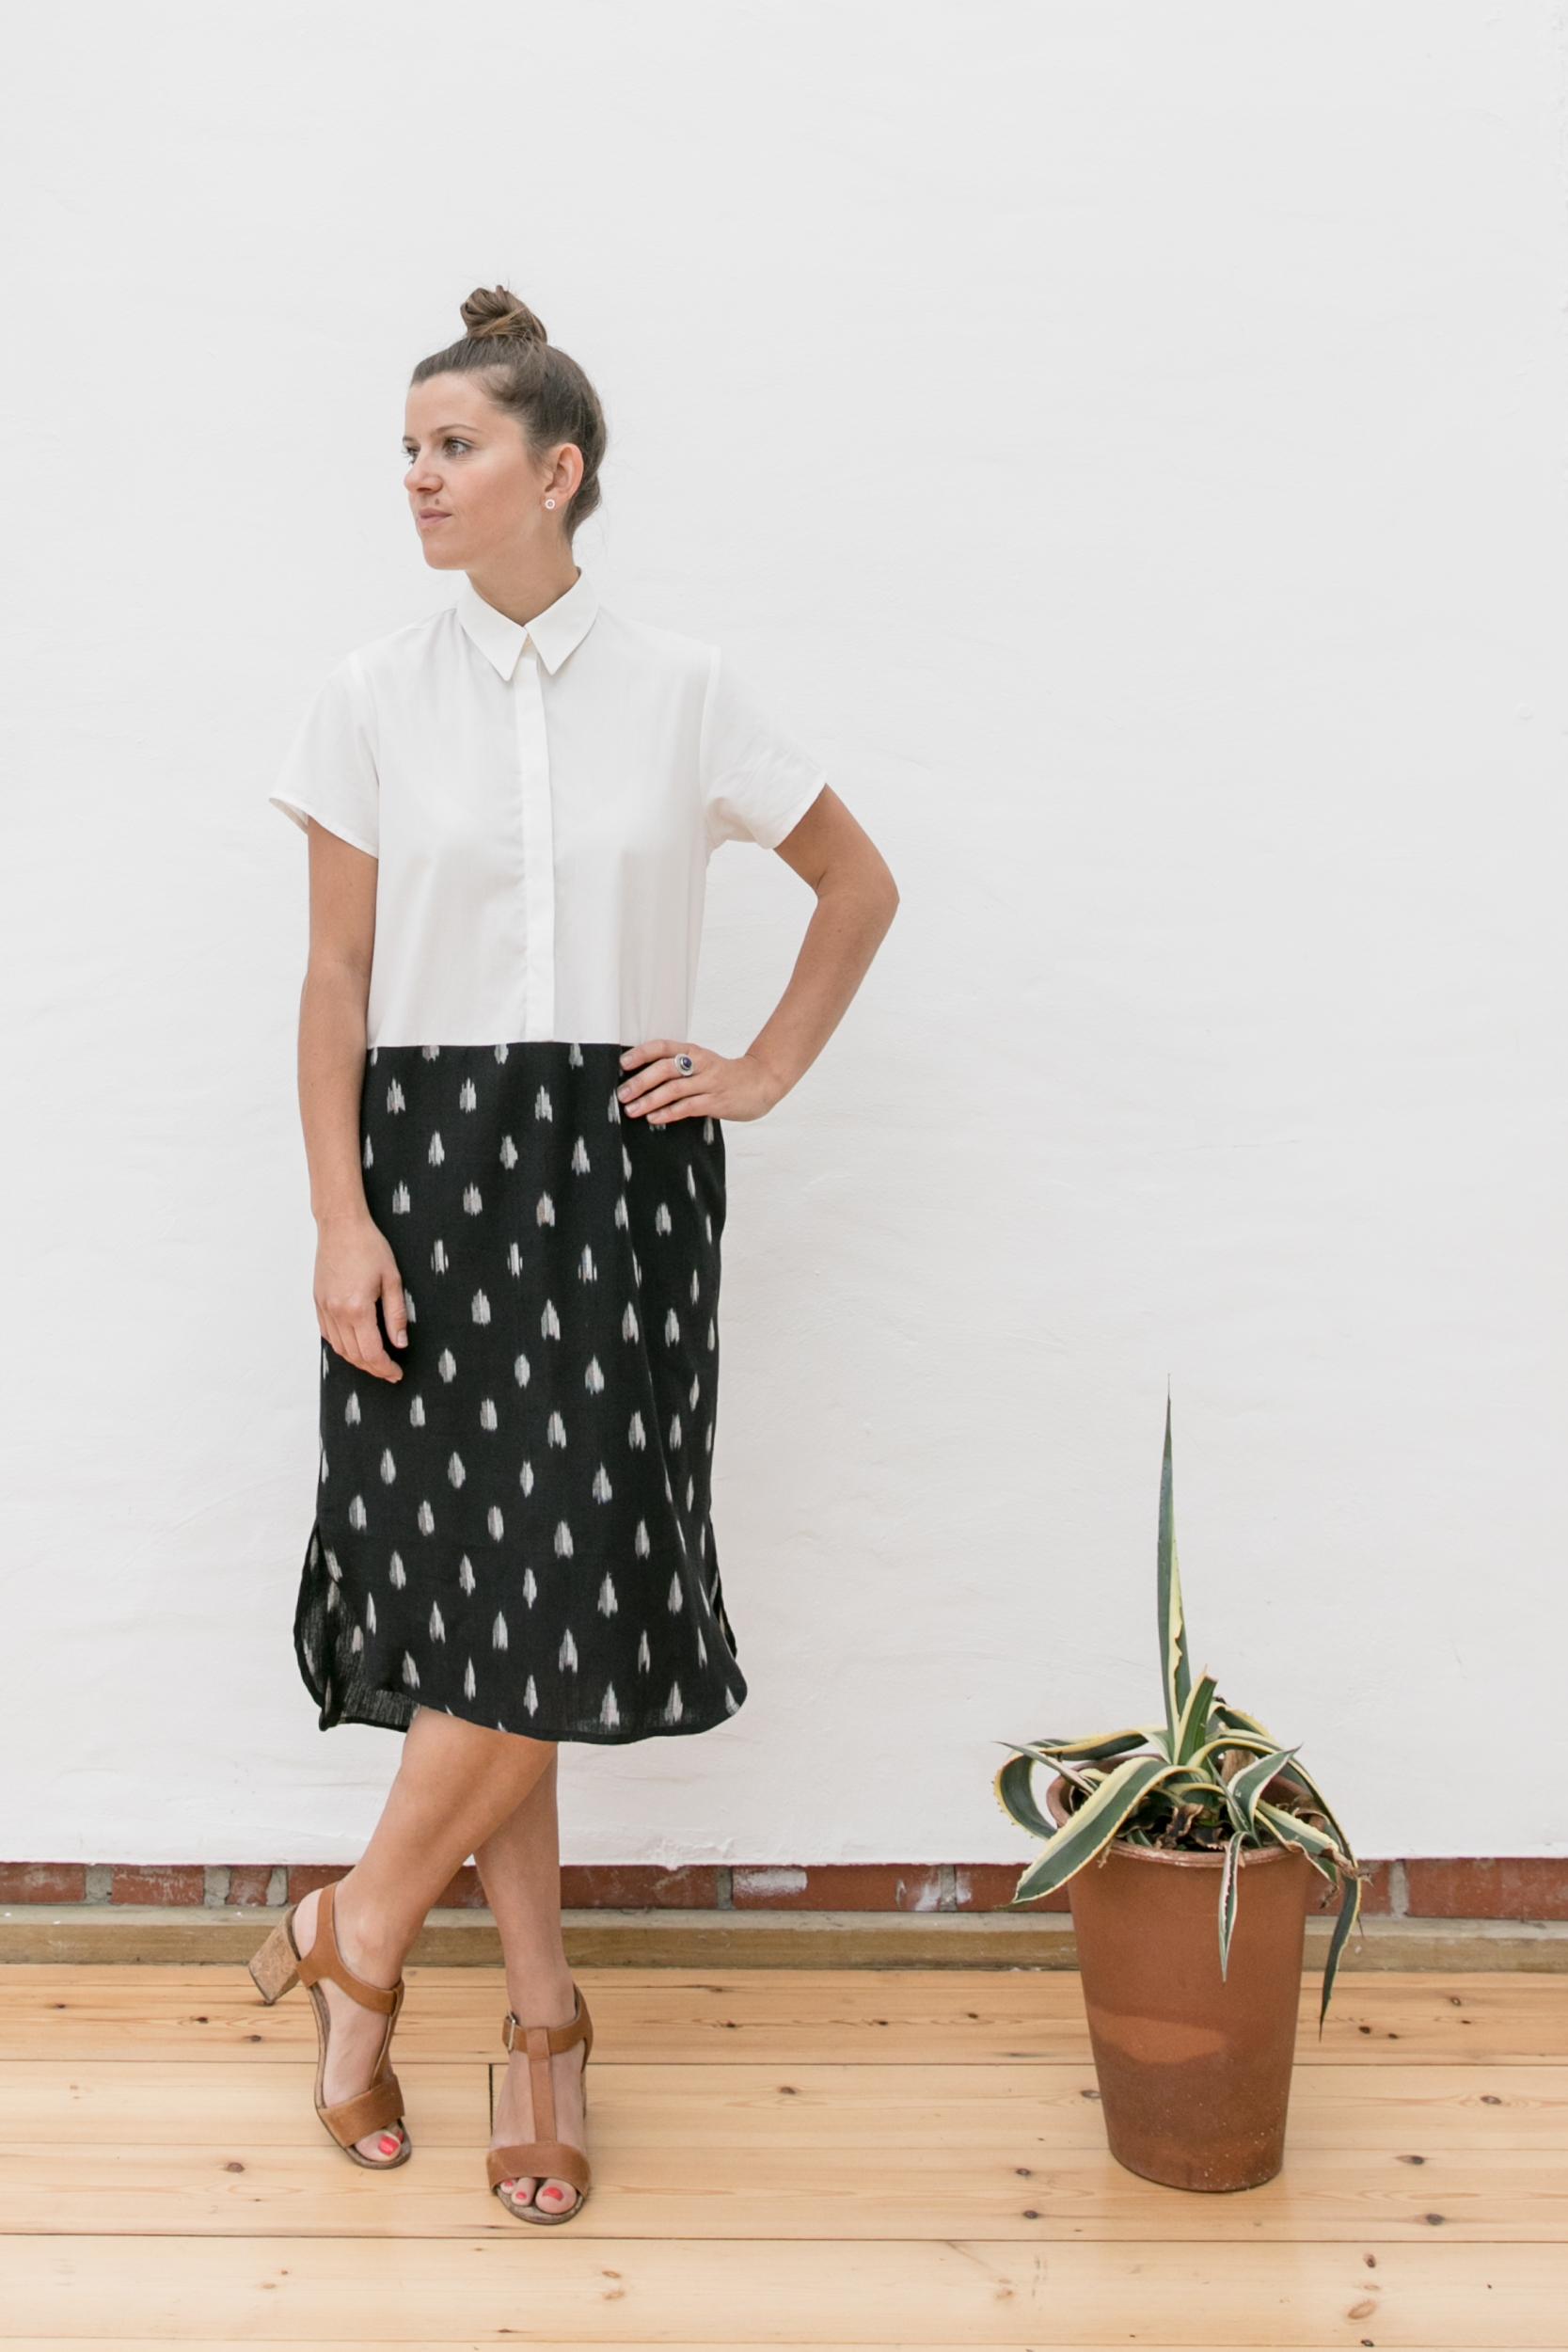 Shakti and Mary Bristol Ethical fashion by Chloe Edwards-0144.jpg